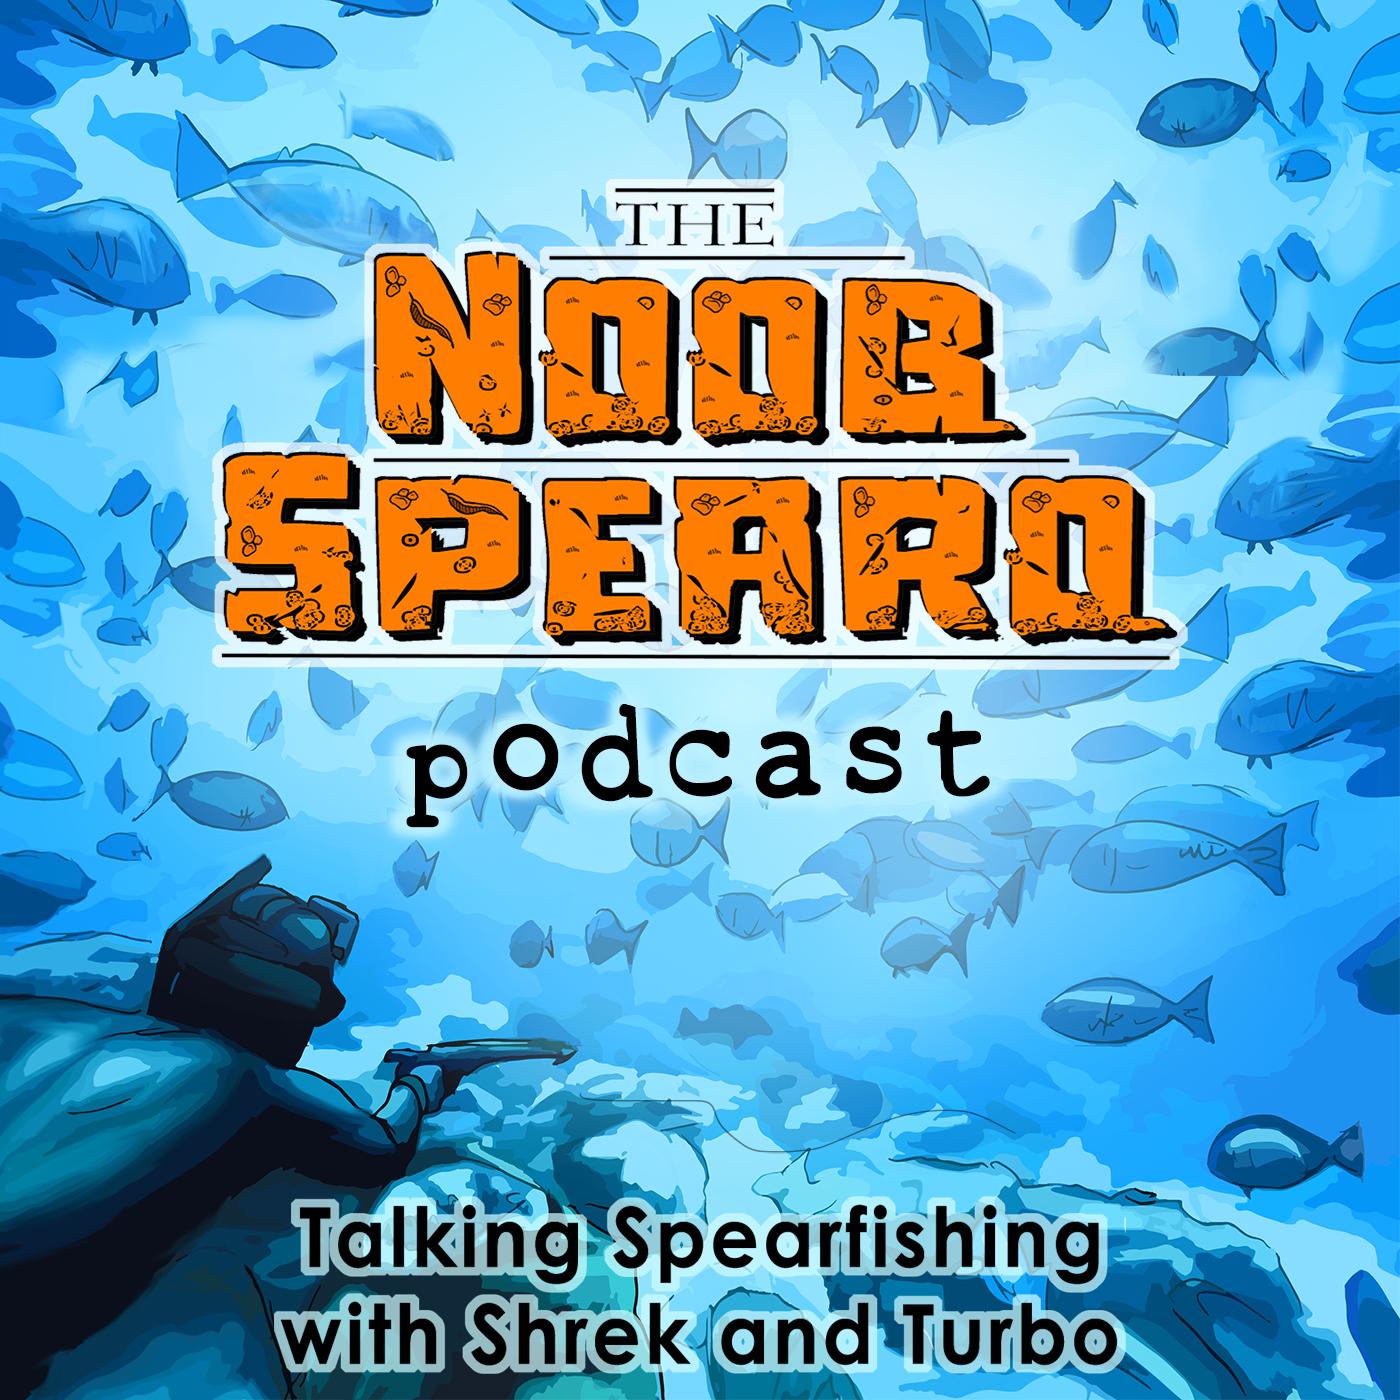 Noob Spearo Spearfishing Community